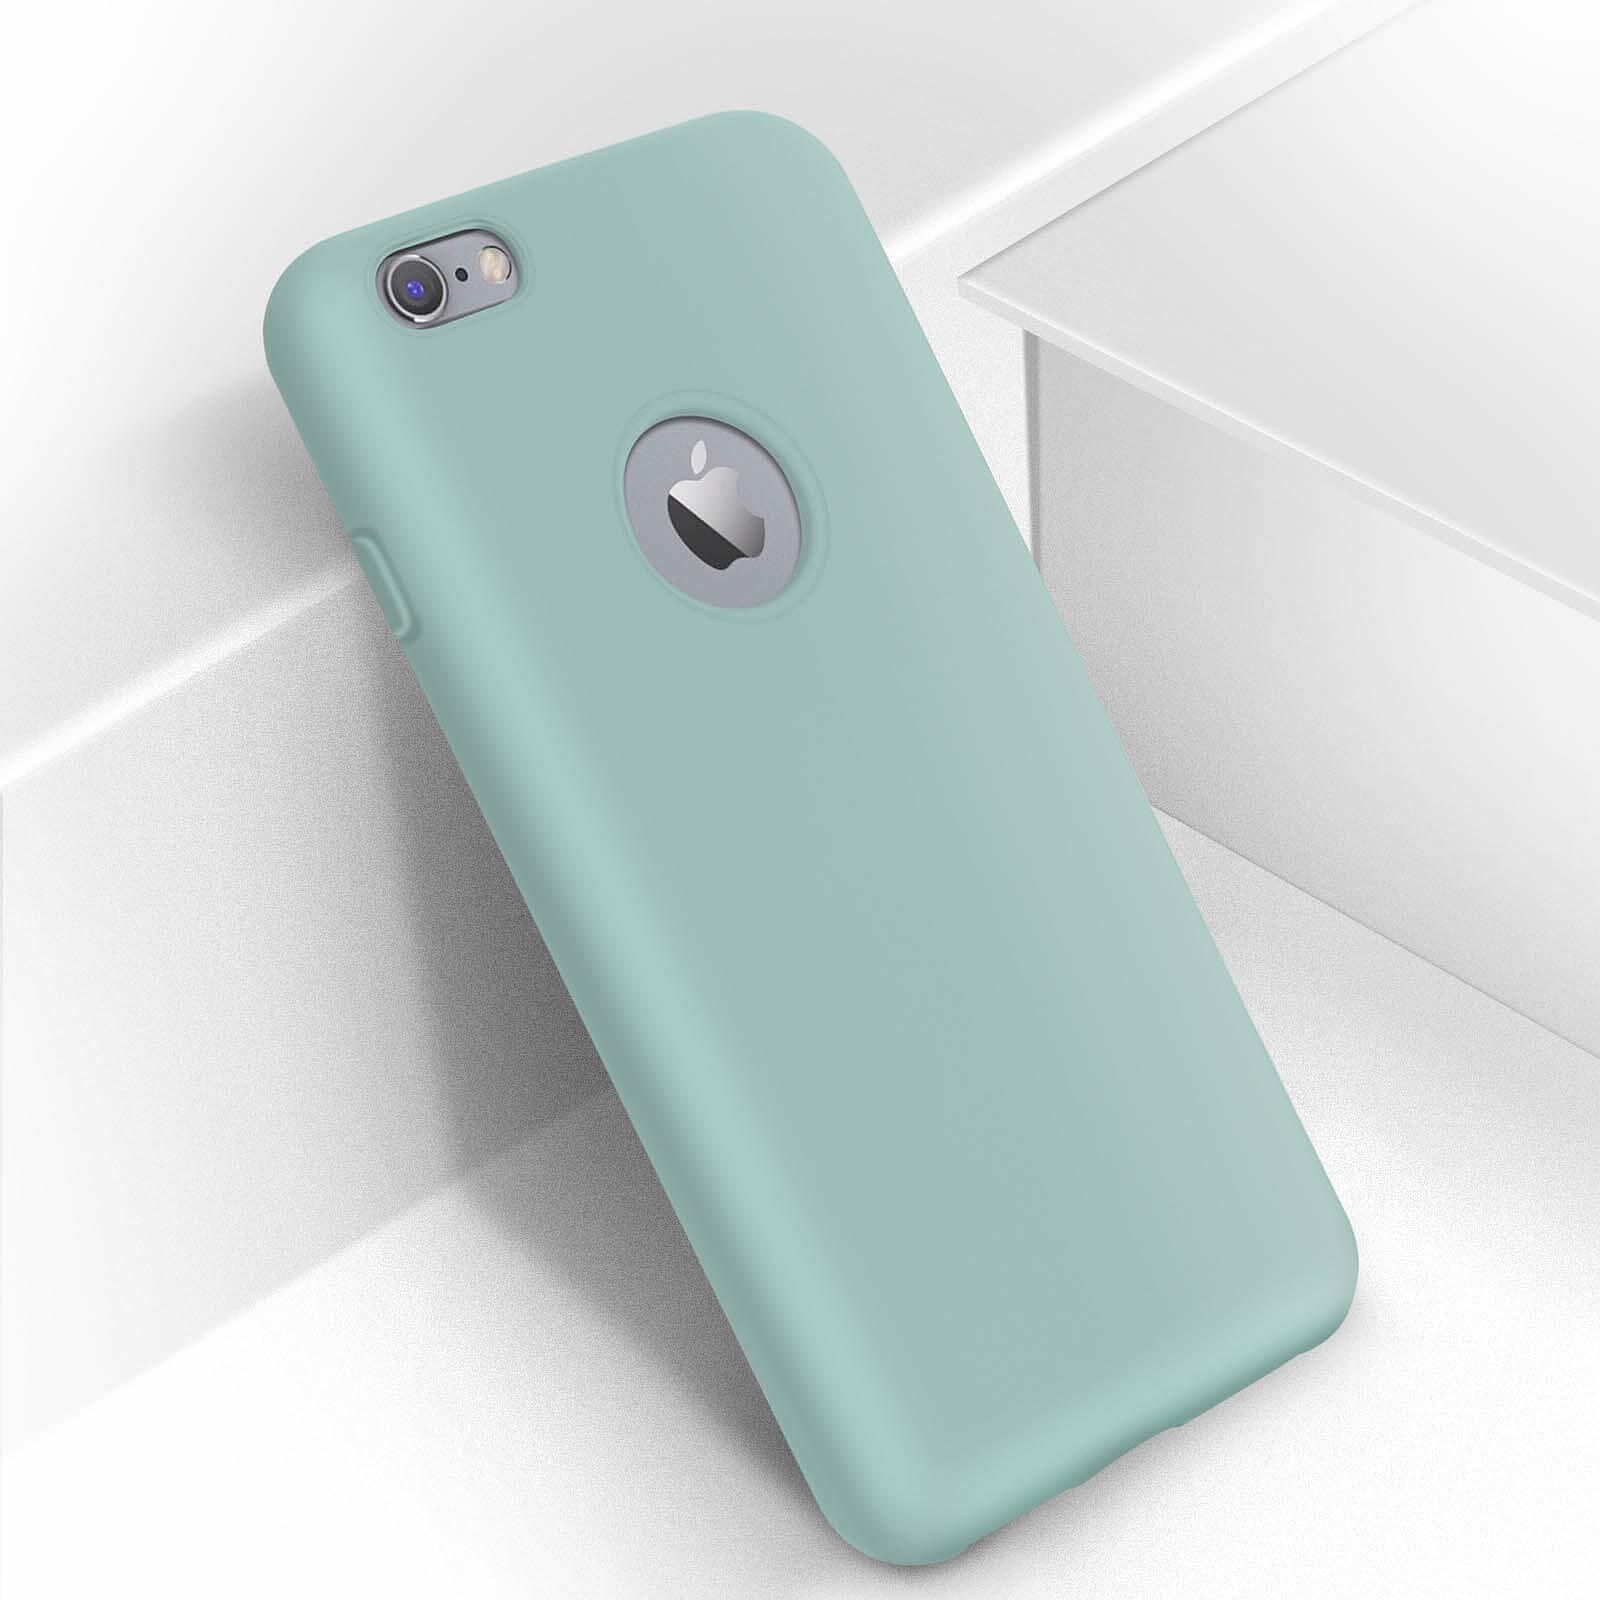 coque iphone 6s apple verte